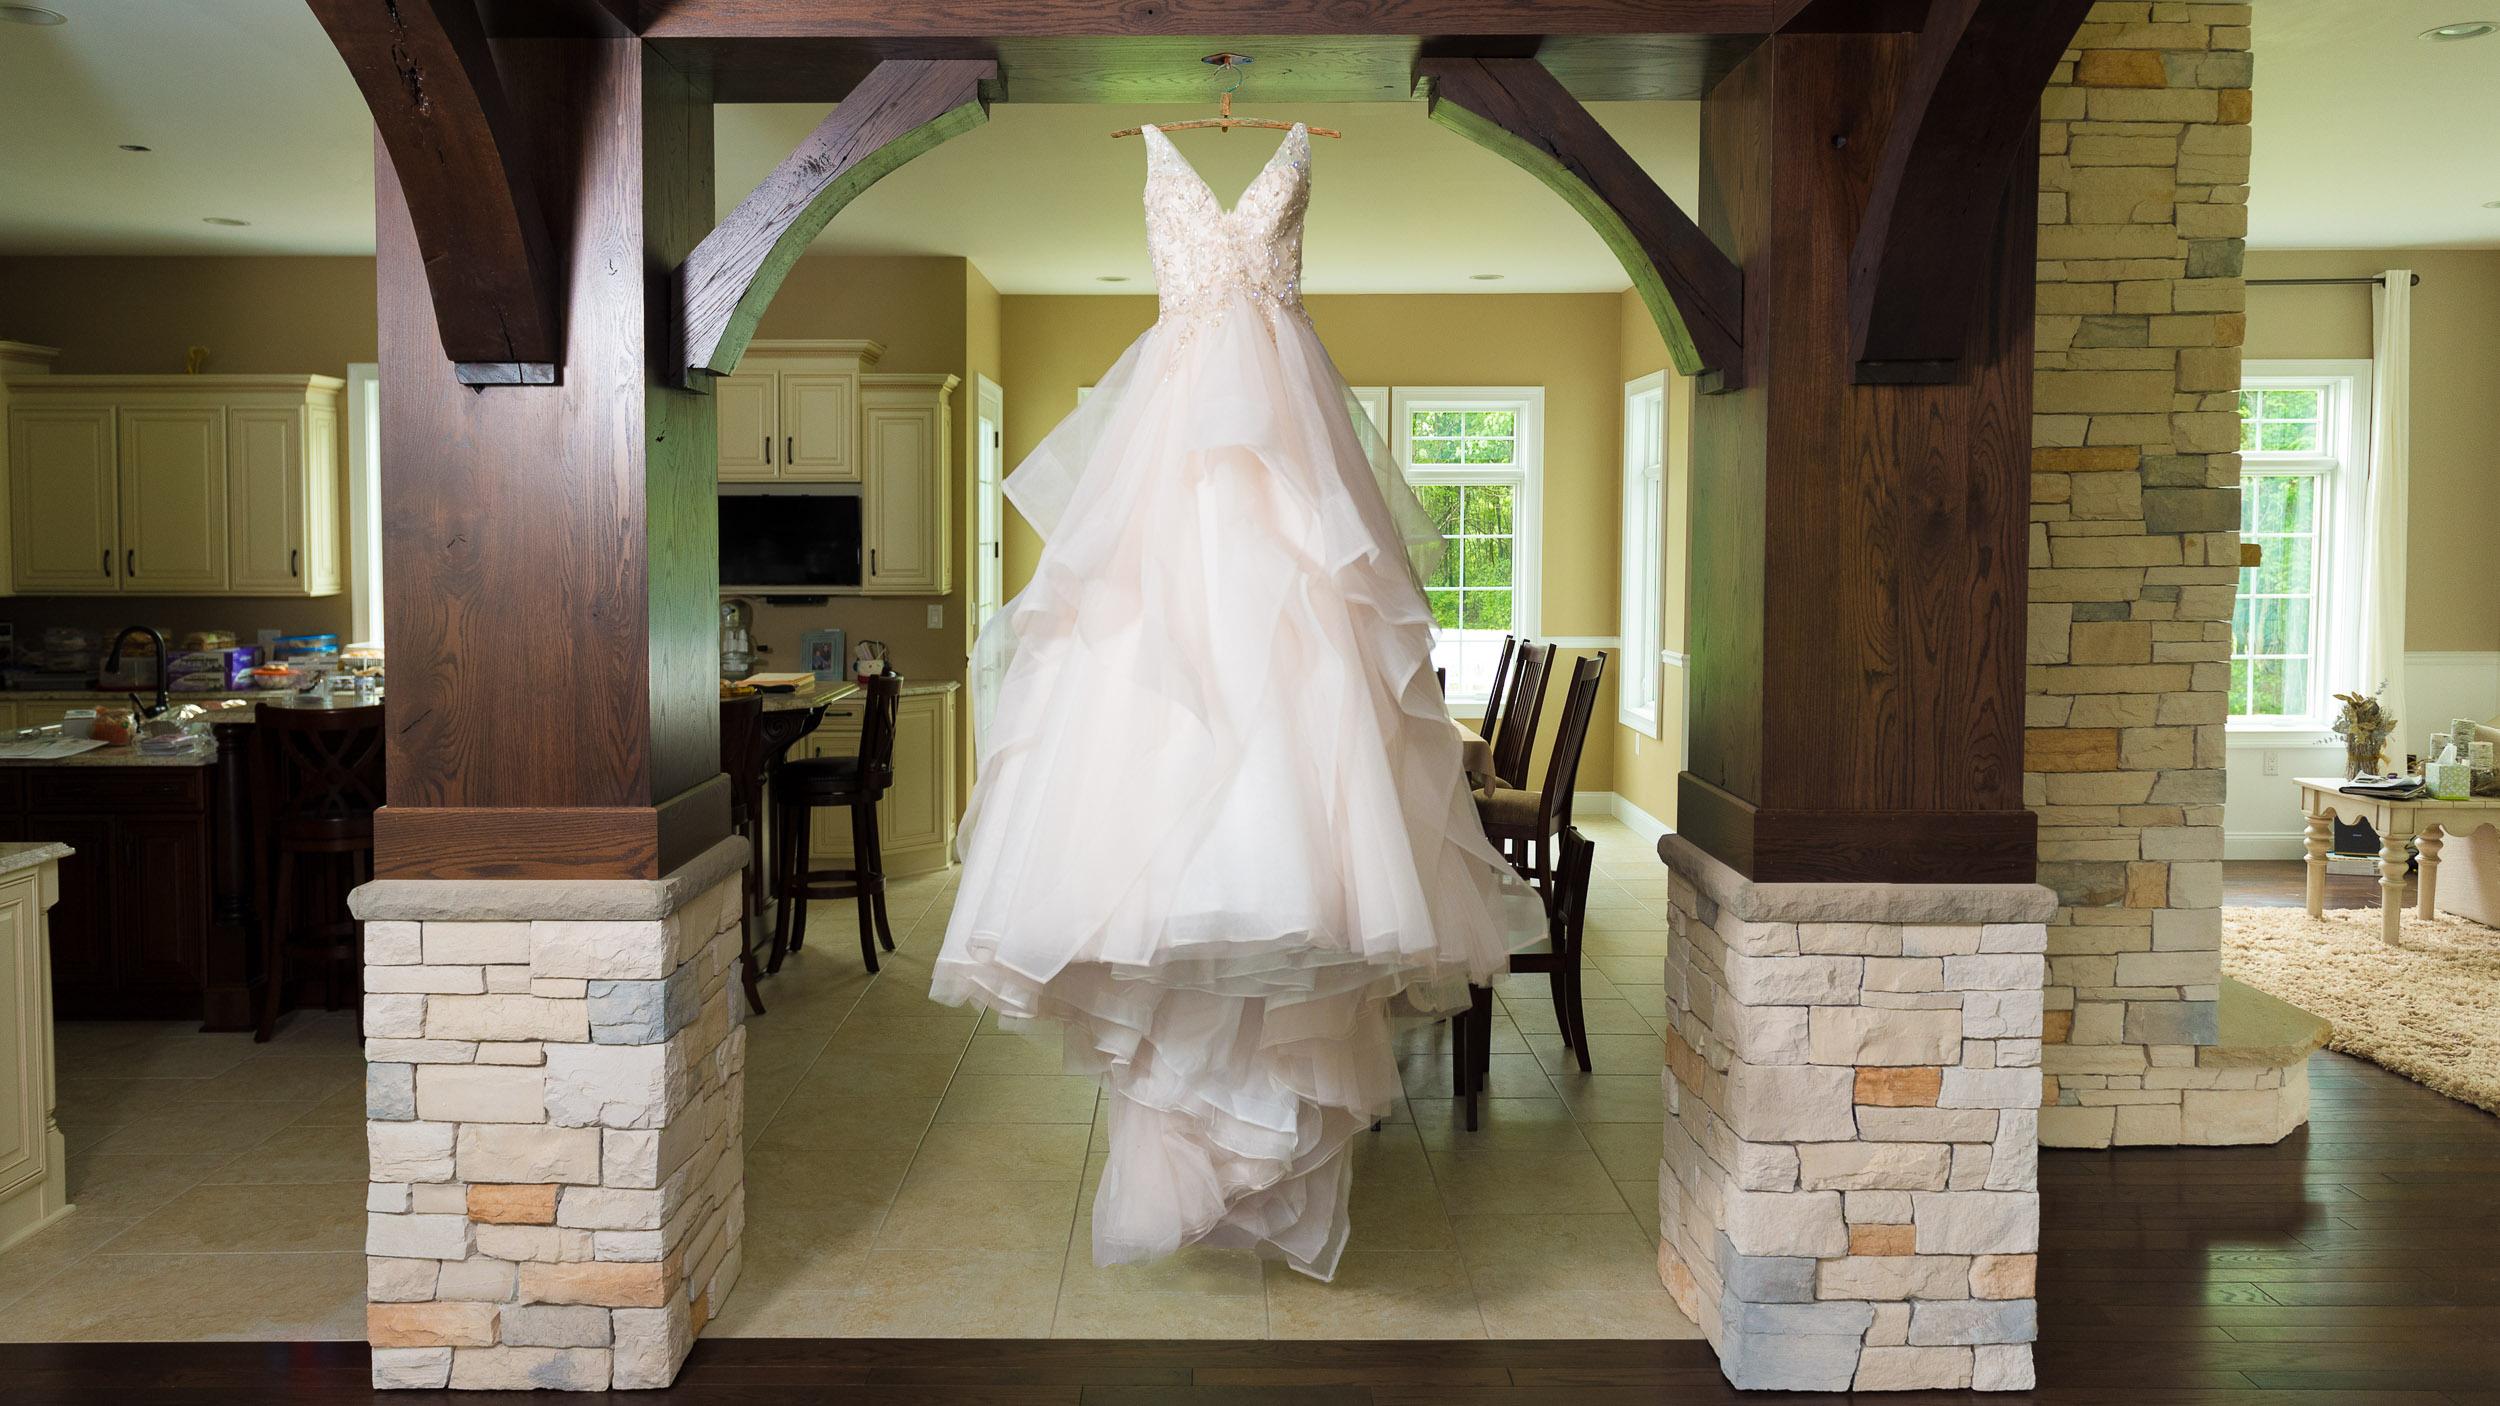 Wedding-dress-hanging-in-hallway.jpg